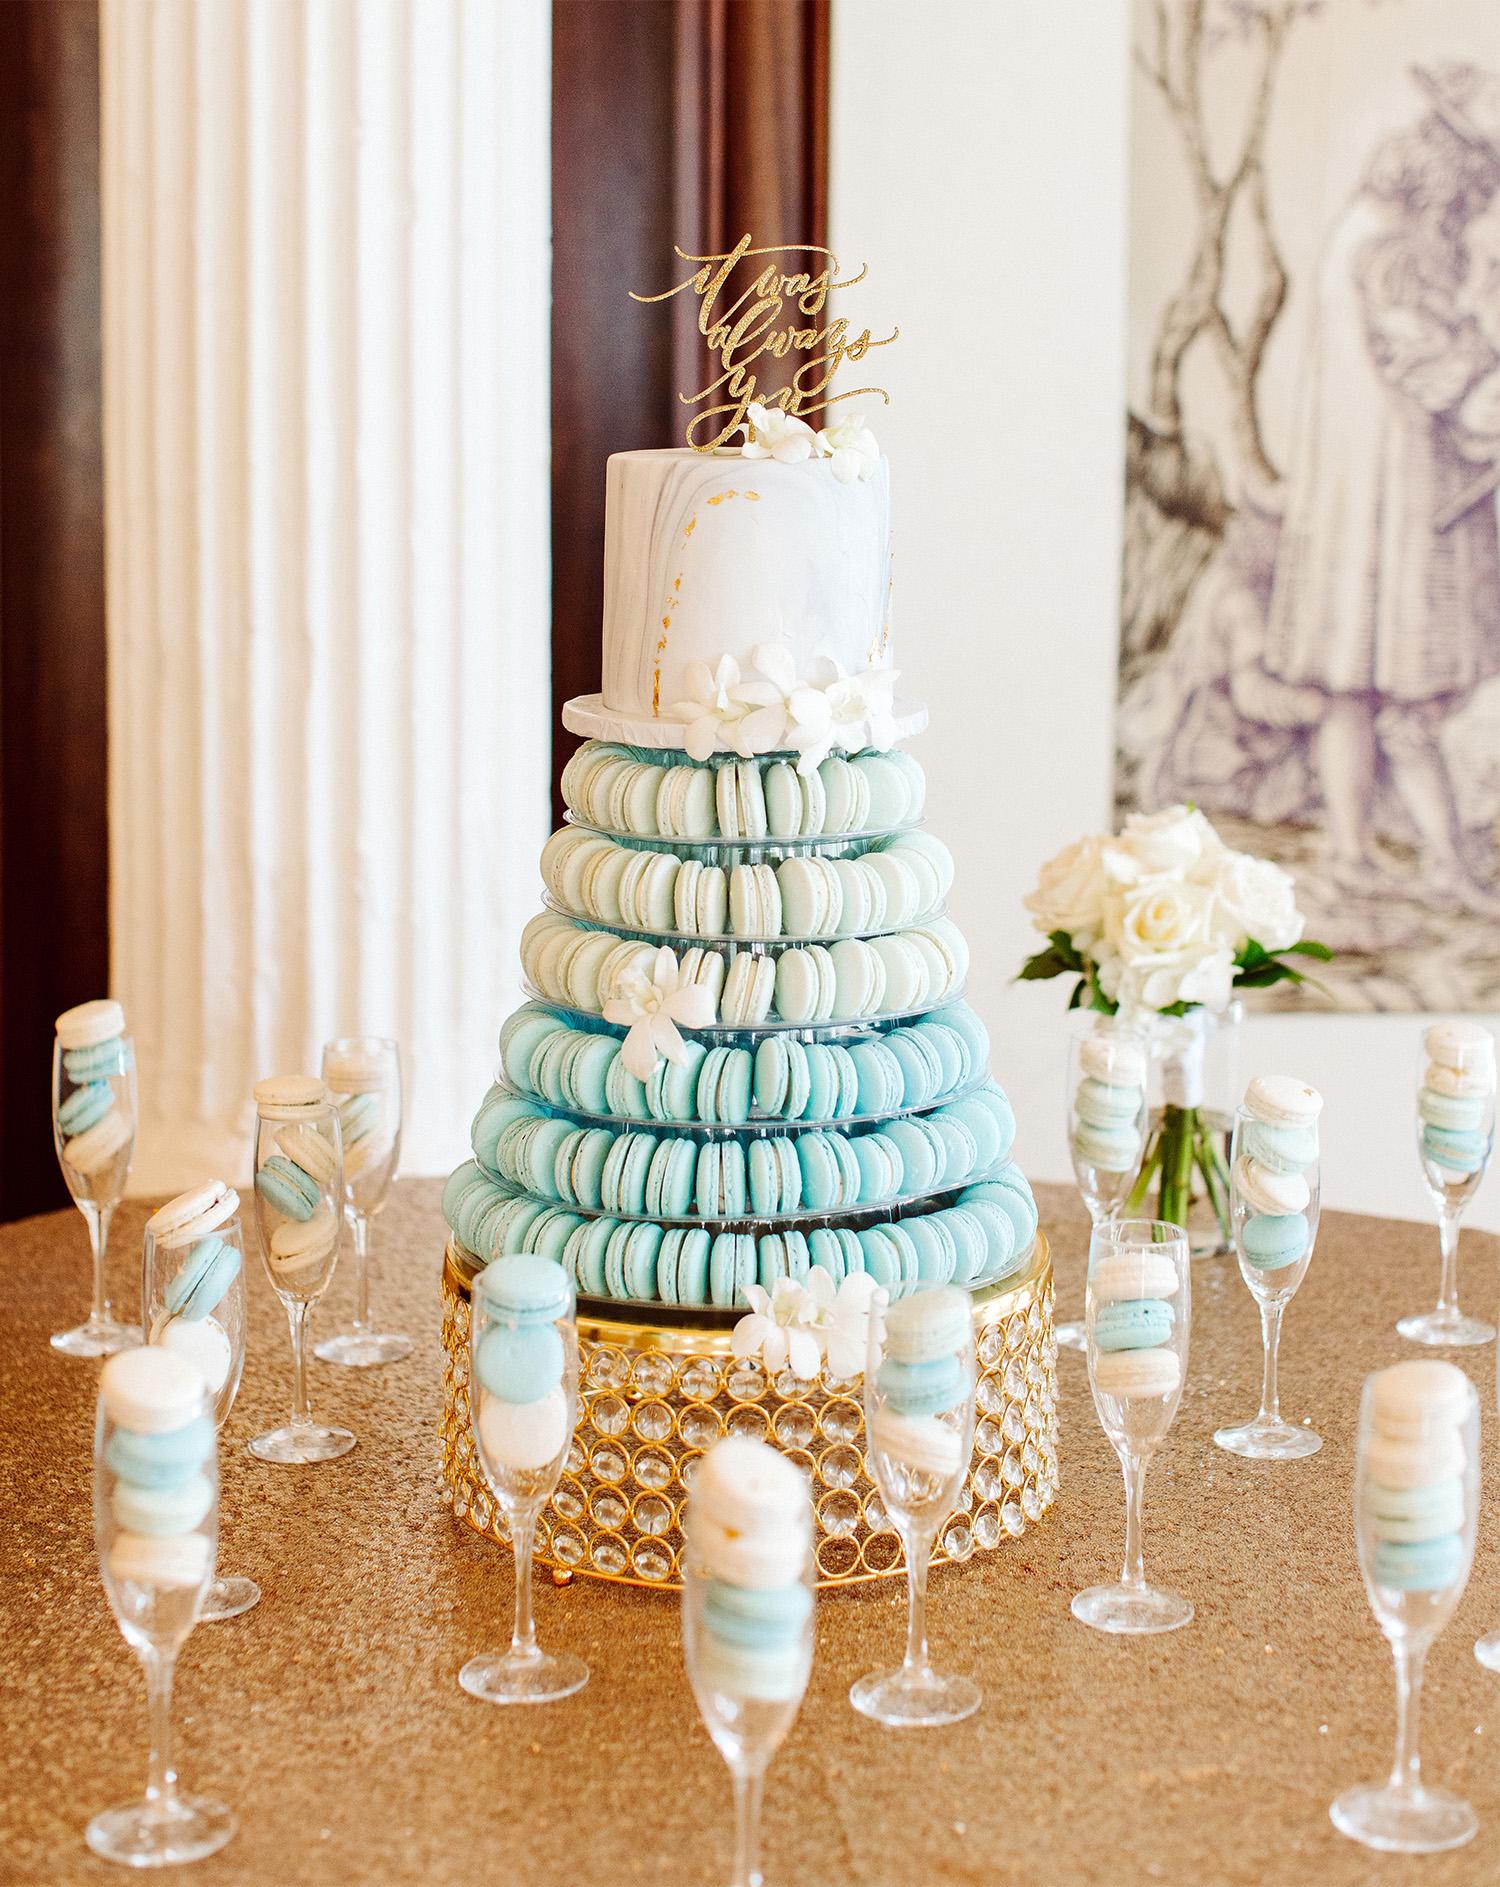 bryanna nick wedding cake macaroons